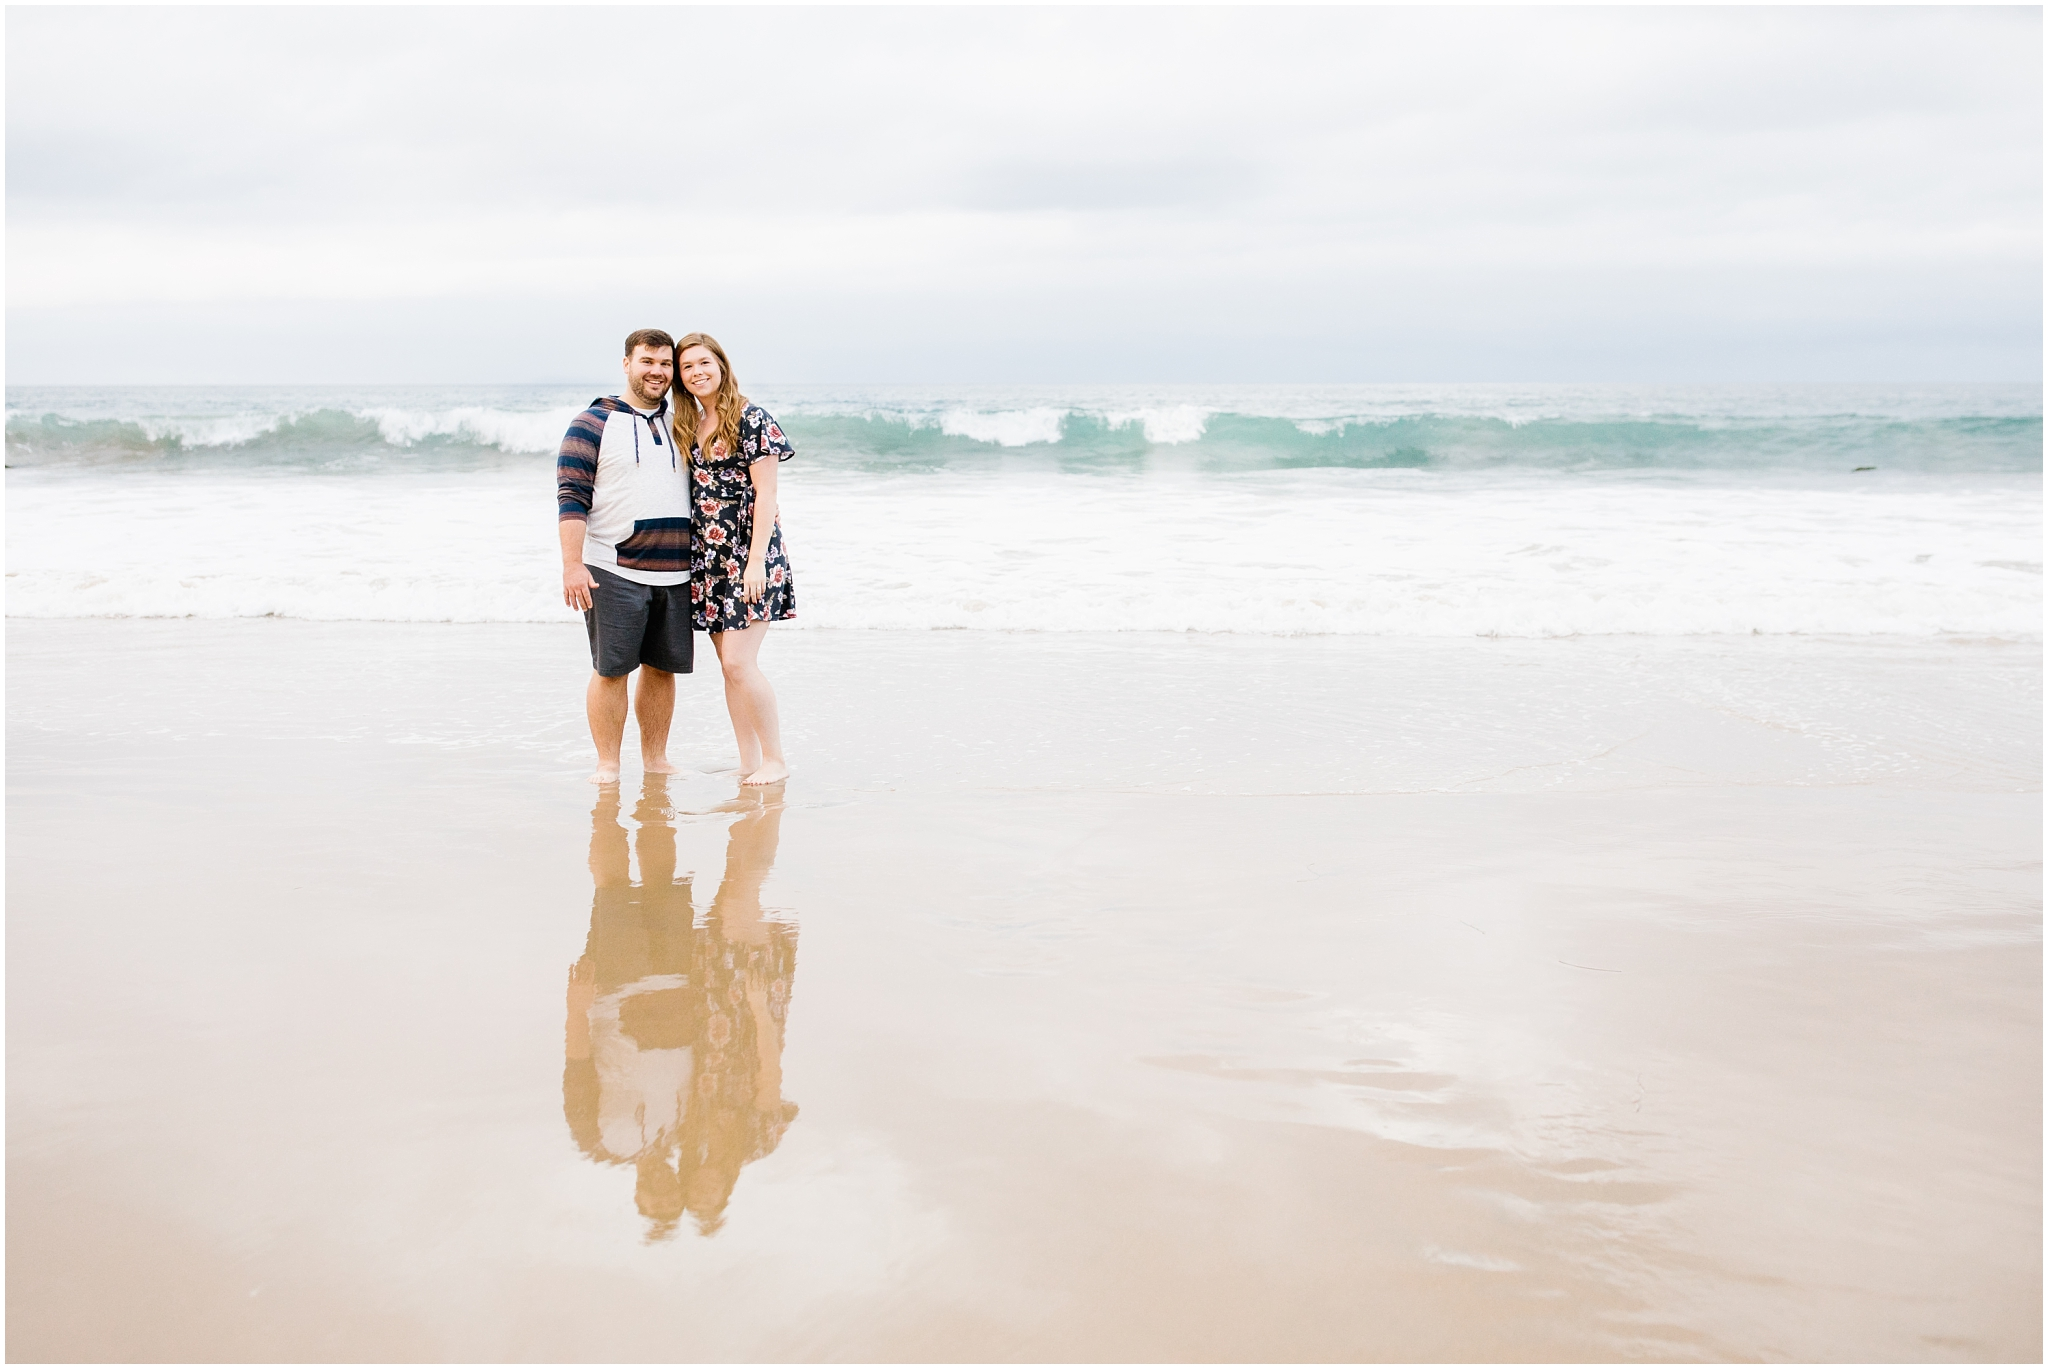 CassandraNathan-11E_Lizzie-B-Imagery-California-Wedding-Photographer-Orange-County-Utah-Park-City-Engagement-Session.jpg